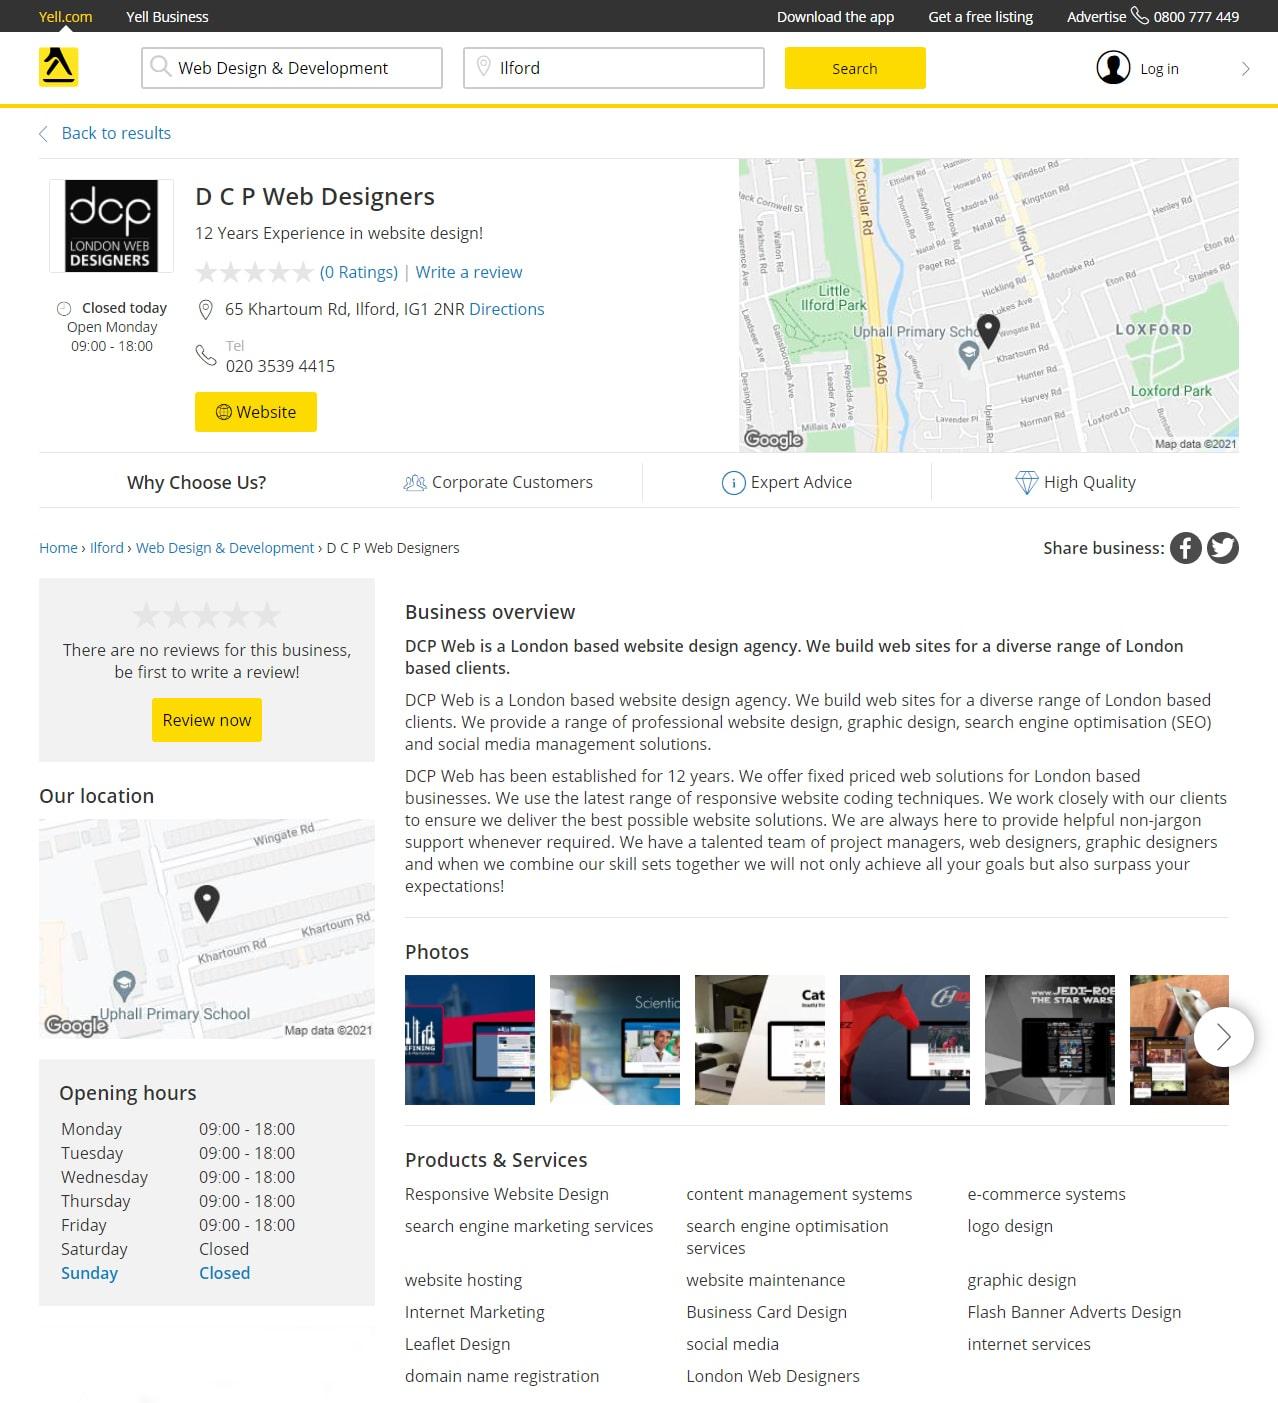 DCP Web Designers Yell Profile